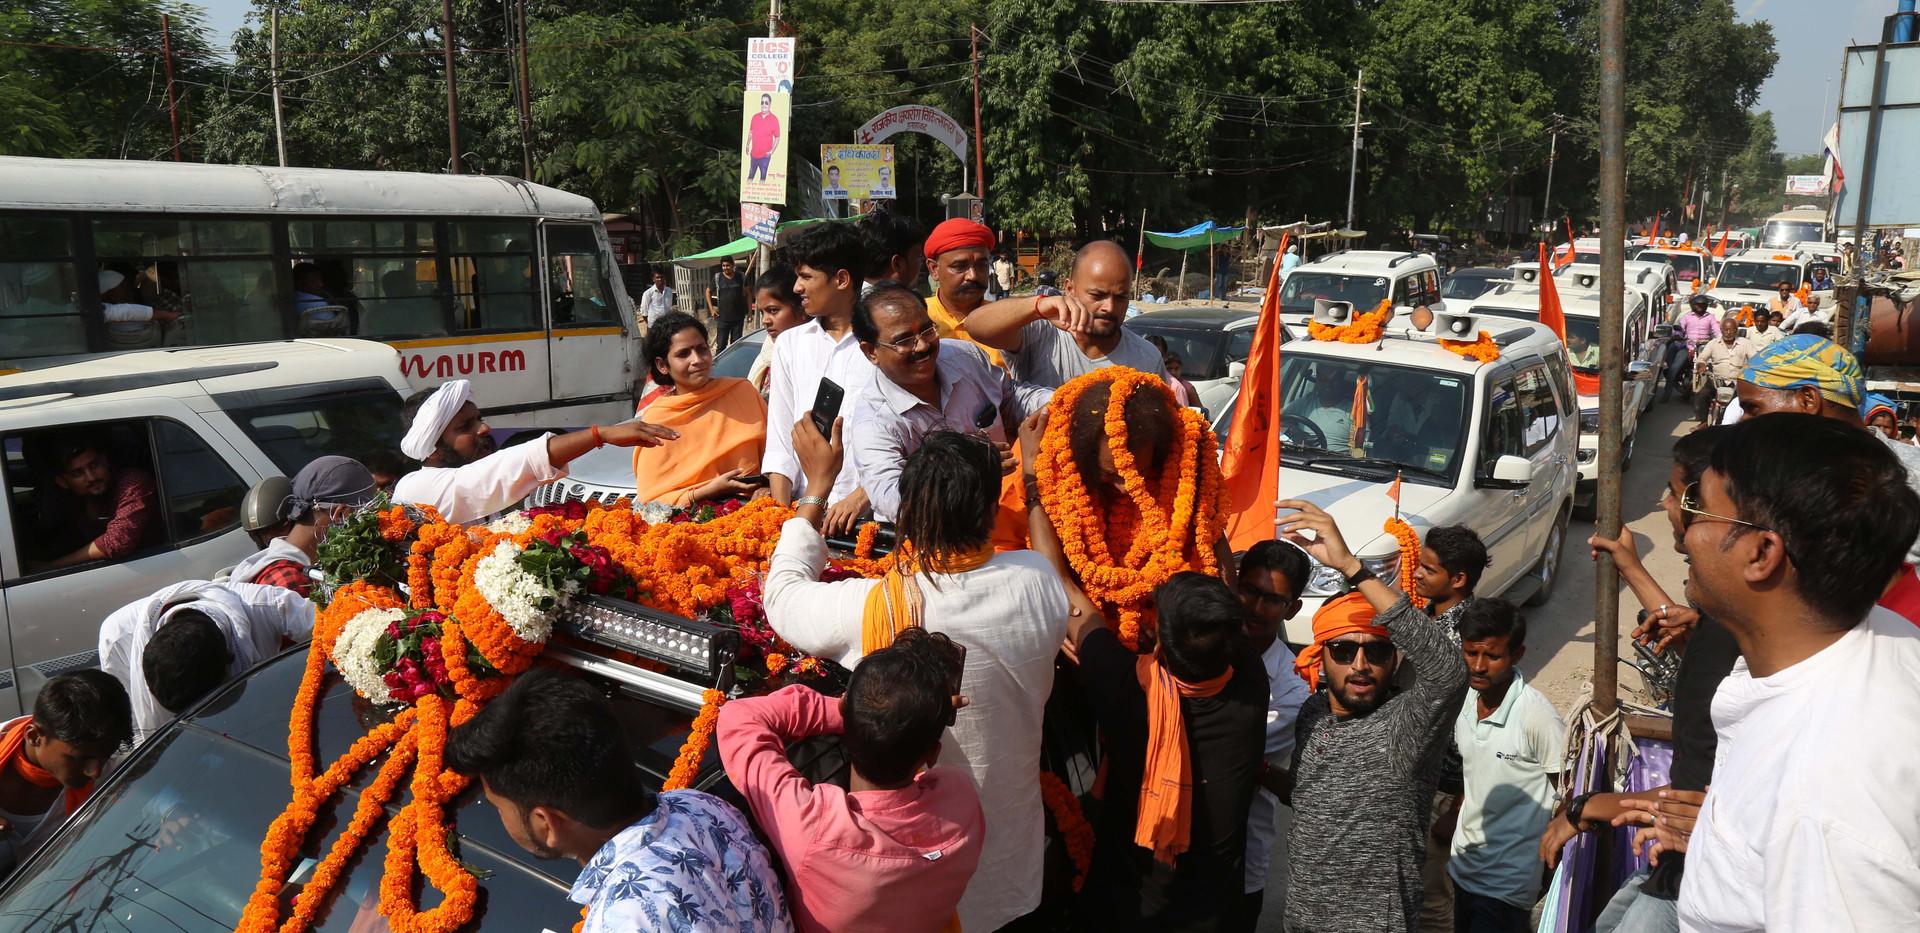 Guruji Yogi Satyam returns to Allahabad